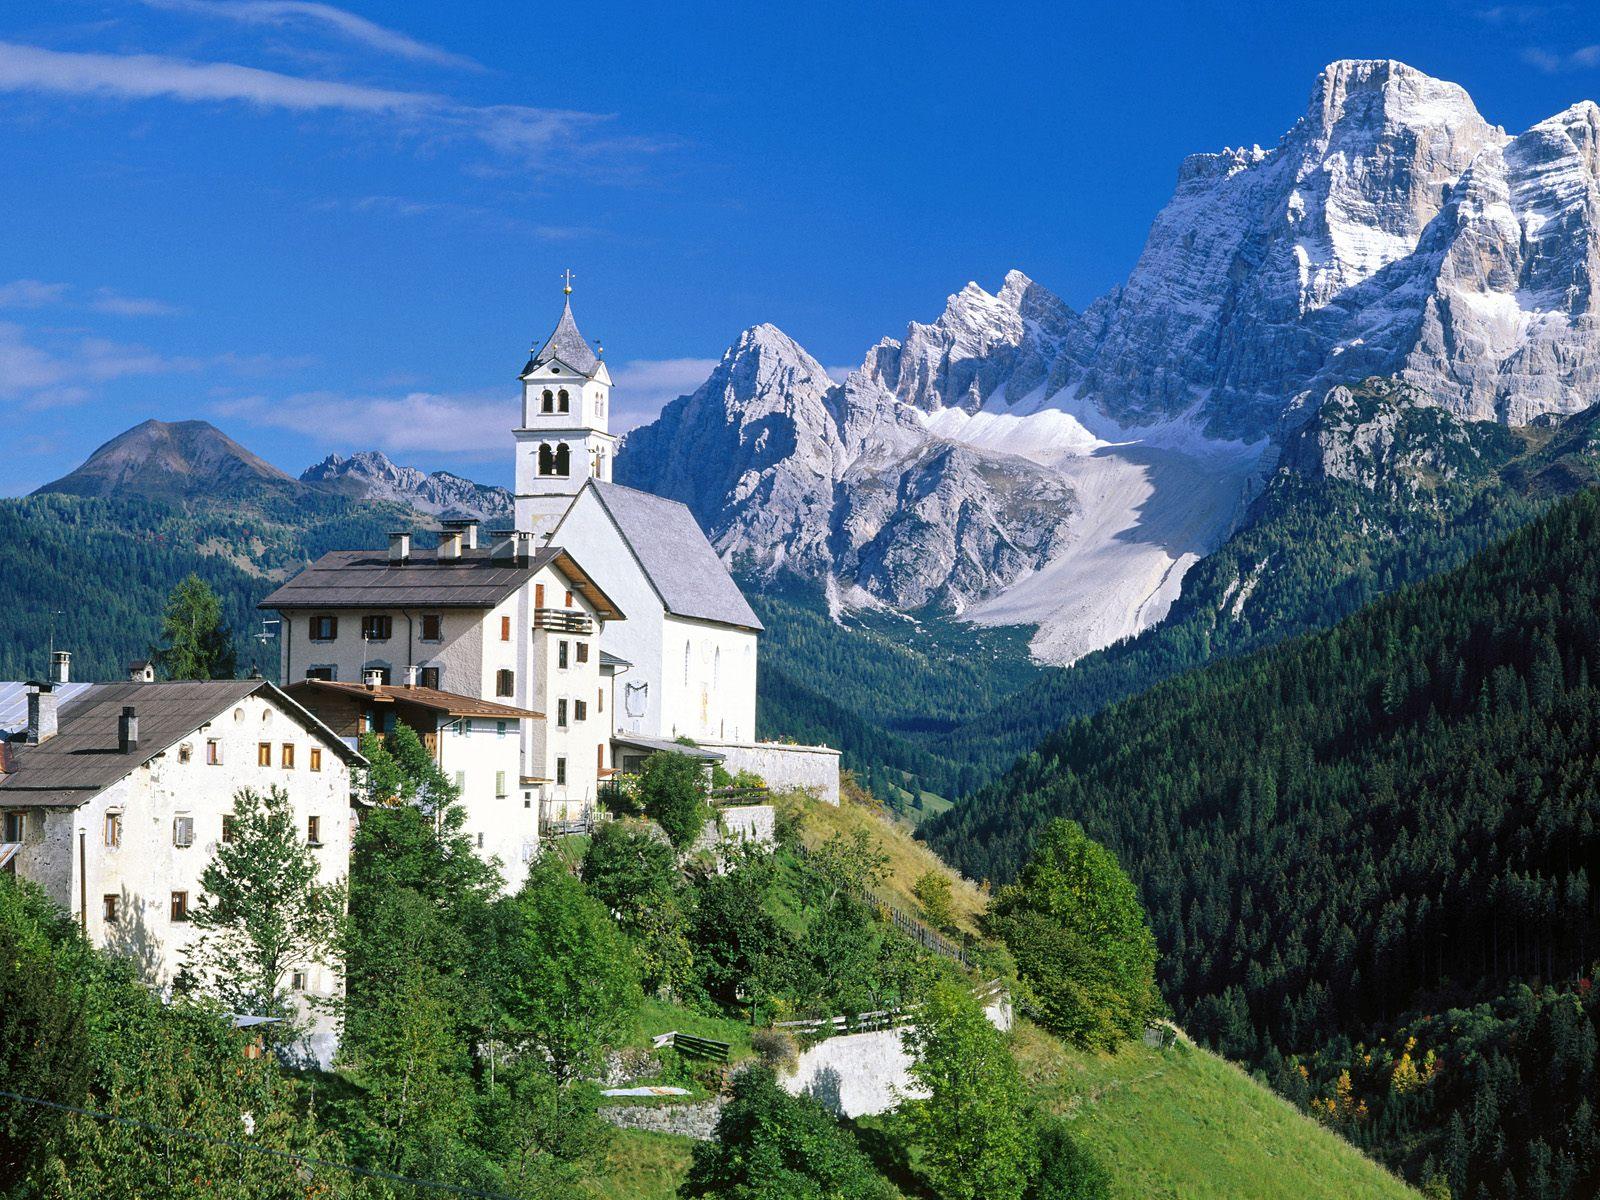 http://1.bp.blogspot.com/-siELheqI2F4/Tcp4shhWUqI/AAAAAAAACYA/I4HCw3O--PA/s1600/The+Dolomites%252C+Alps%252C+Italy.jpg